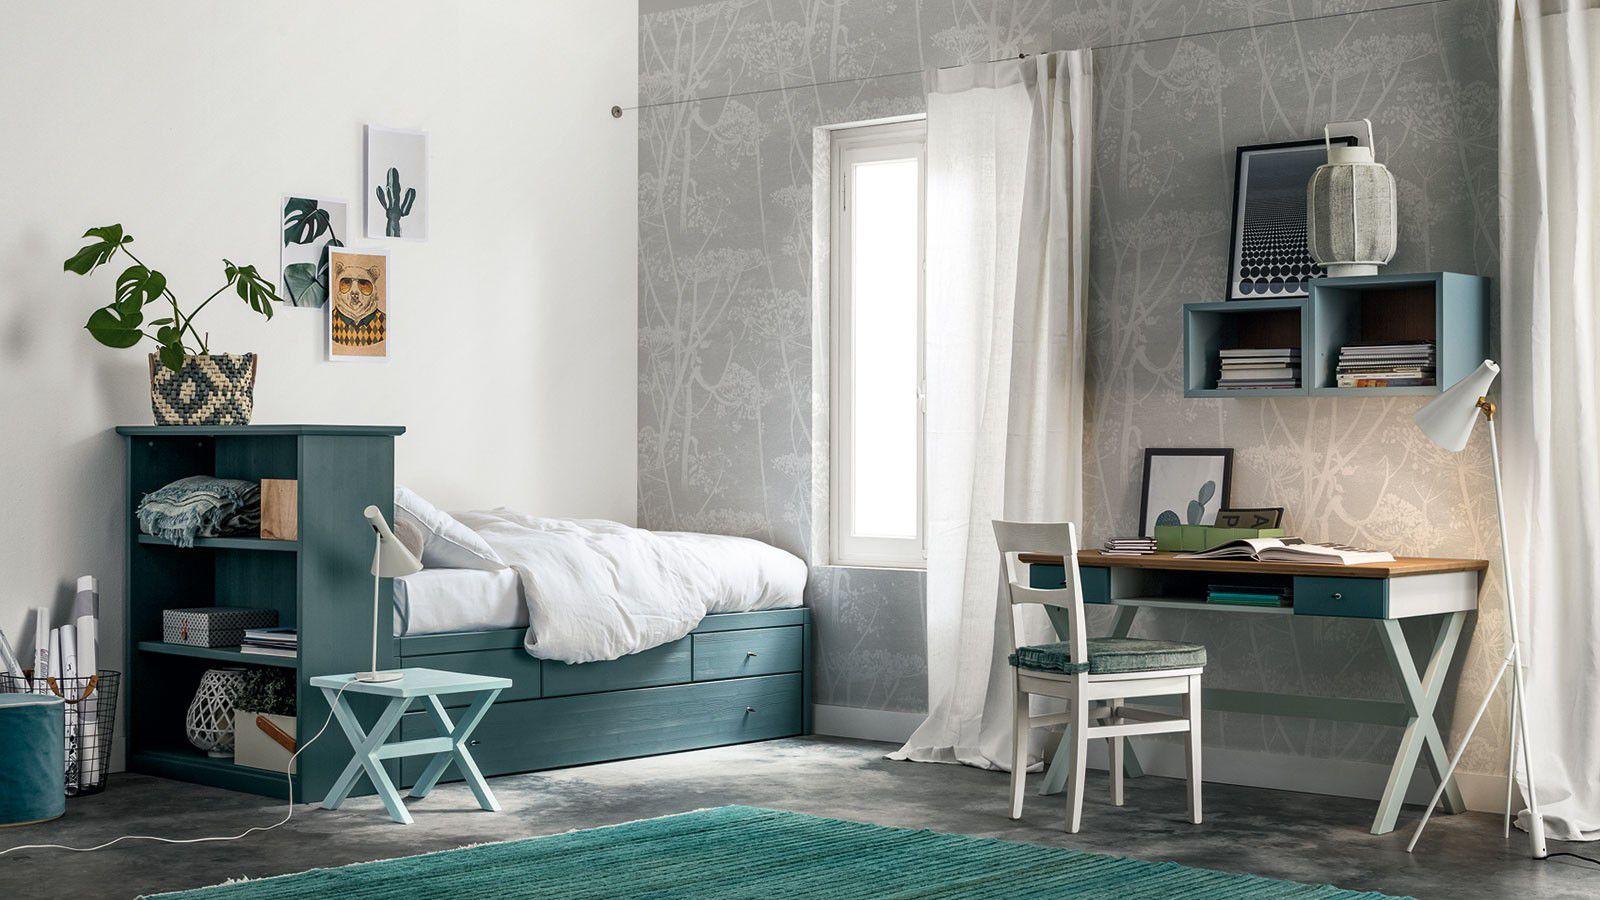 Wooden Children S Bedroom Furniture Set Every Day Room 2 Callesella Unisex